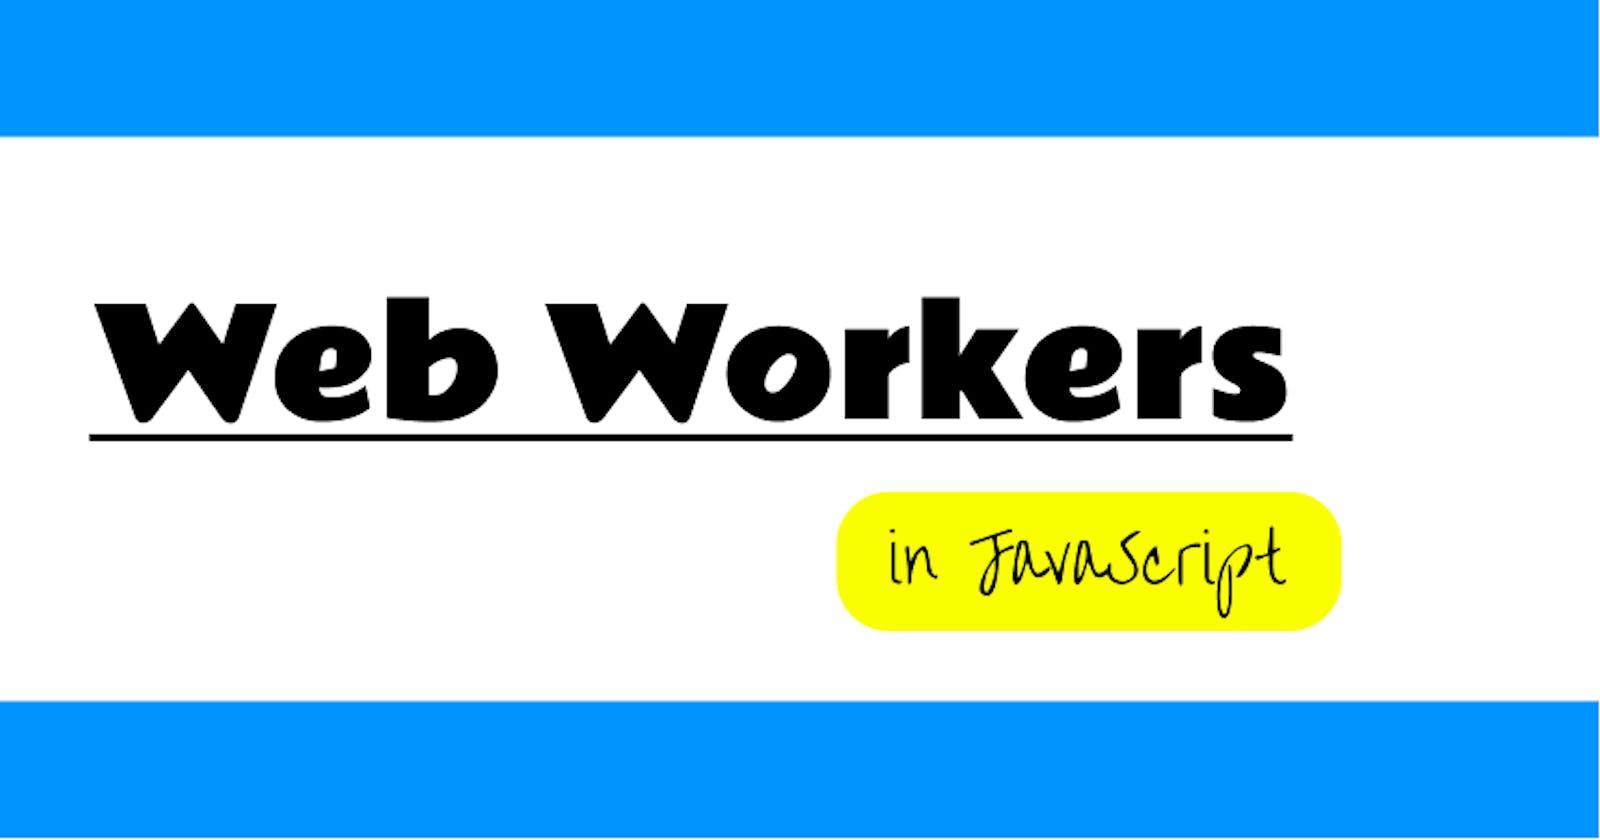 Web Workers in JavaScripts.